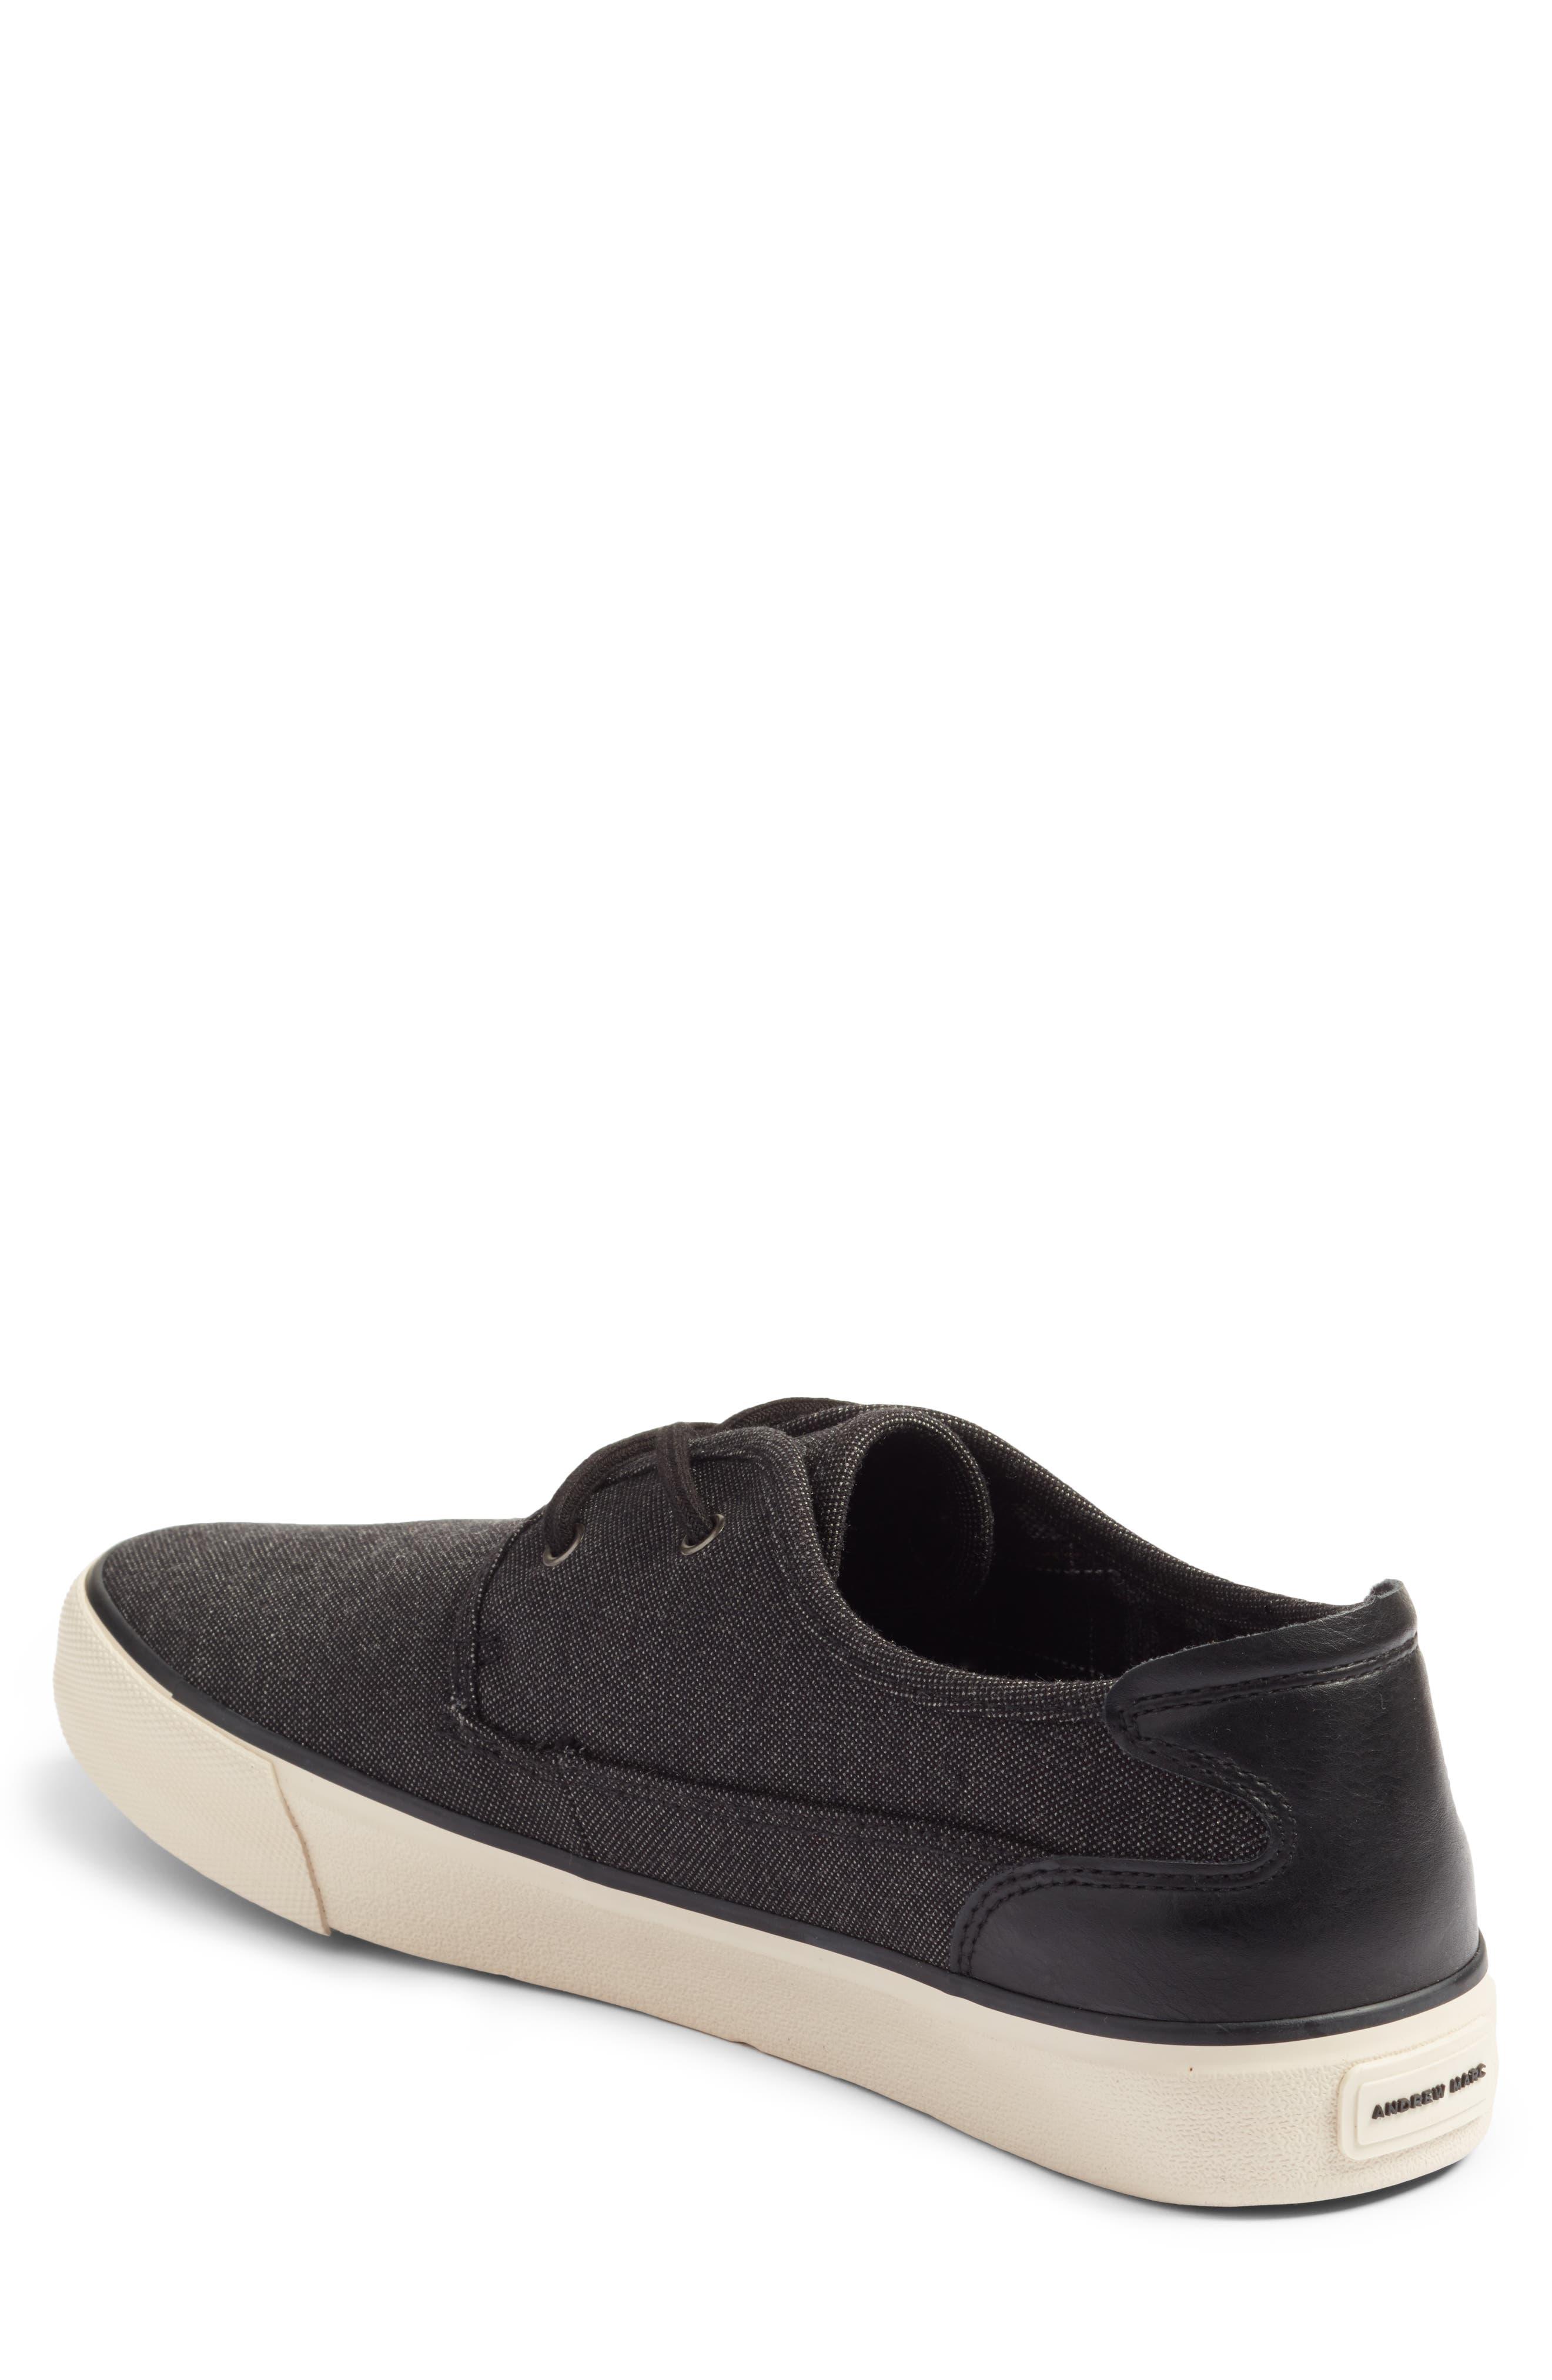 Morris Sneaker,                             Alternate thumbnail 2, color,                             Black/ Bone